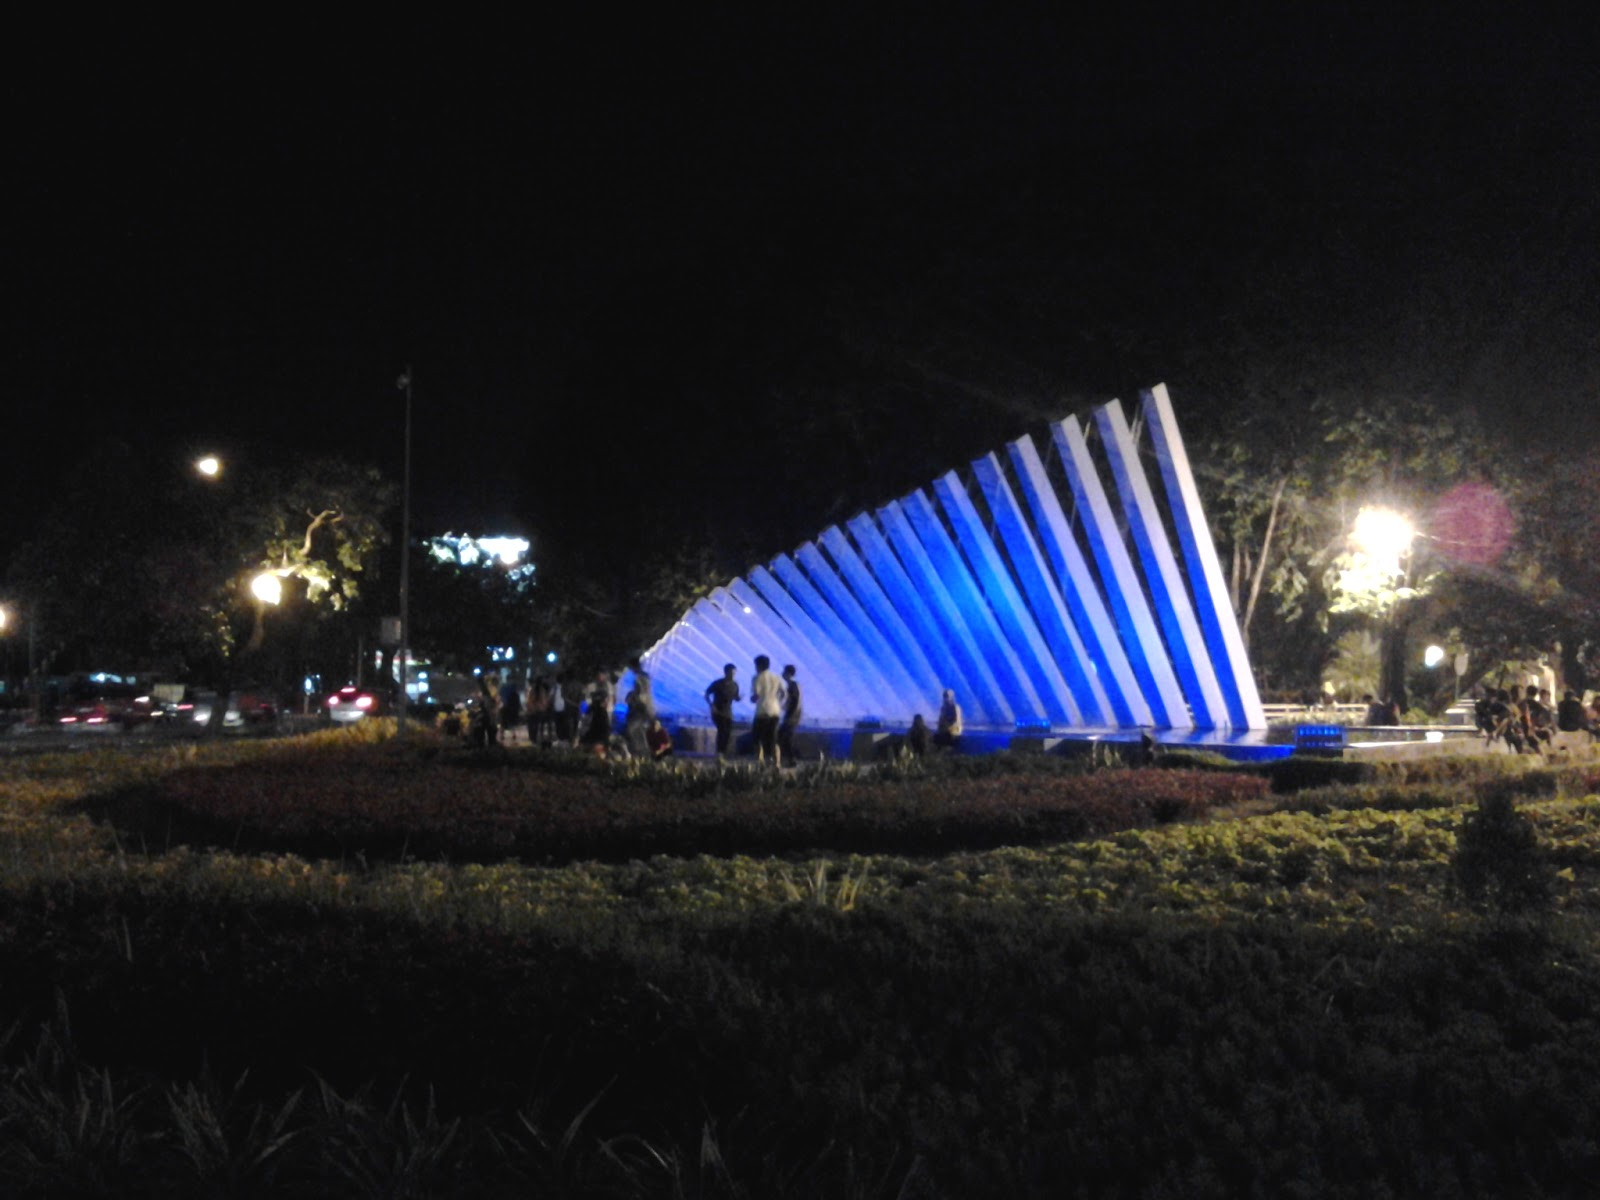 Taman Pelangi Surabaya Sisi Lain Kota Suasana Keindahan Semakin Terasa